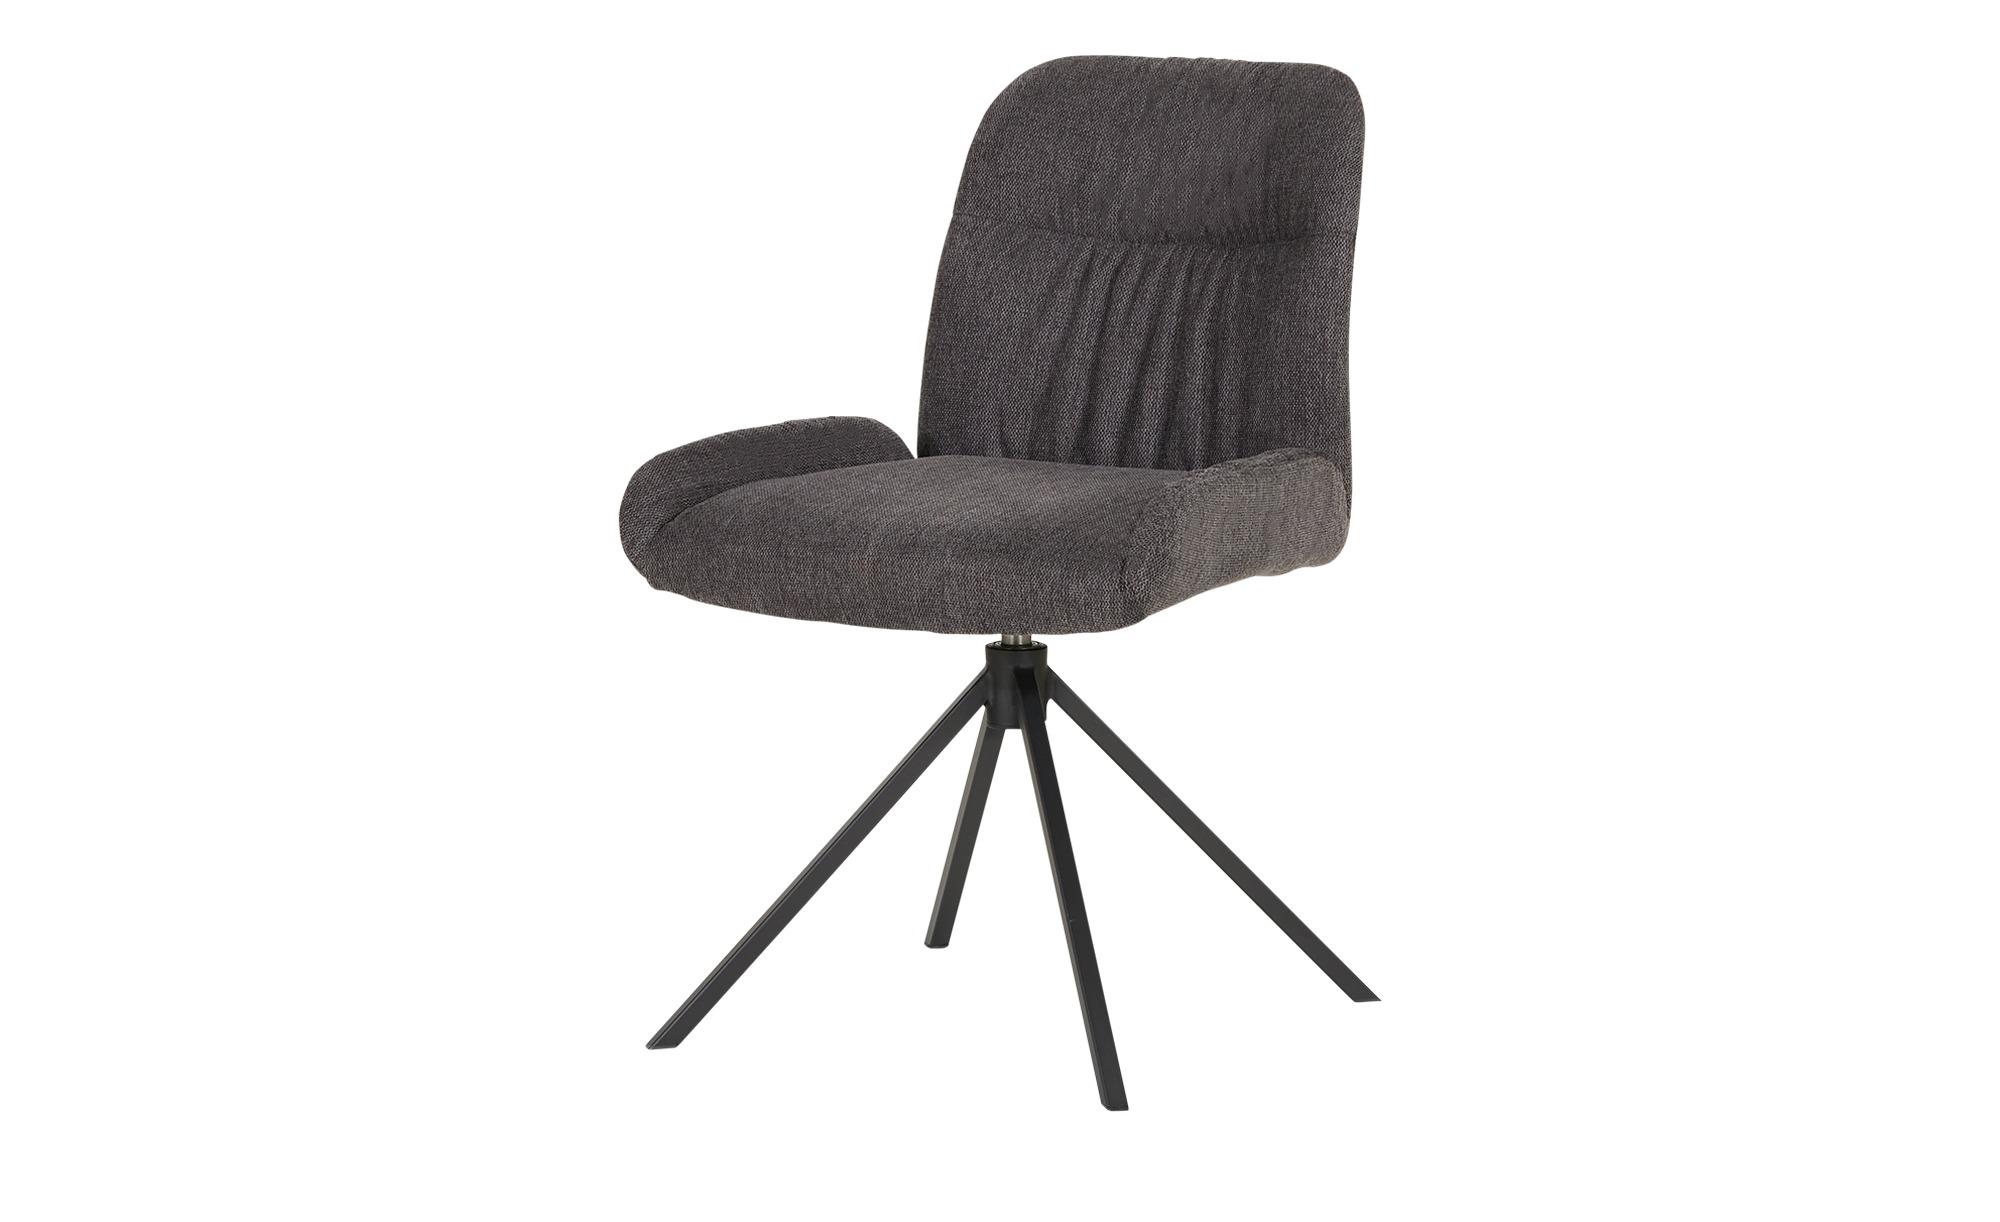 uno Polsterstuhl drehbar  Shanti ¦ grau Stühle > Küchenstühle > Küchenstühle mit Armlehnen - Höffner